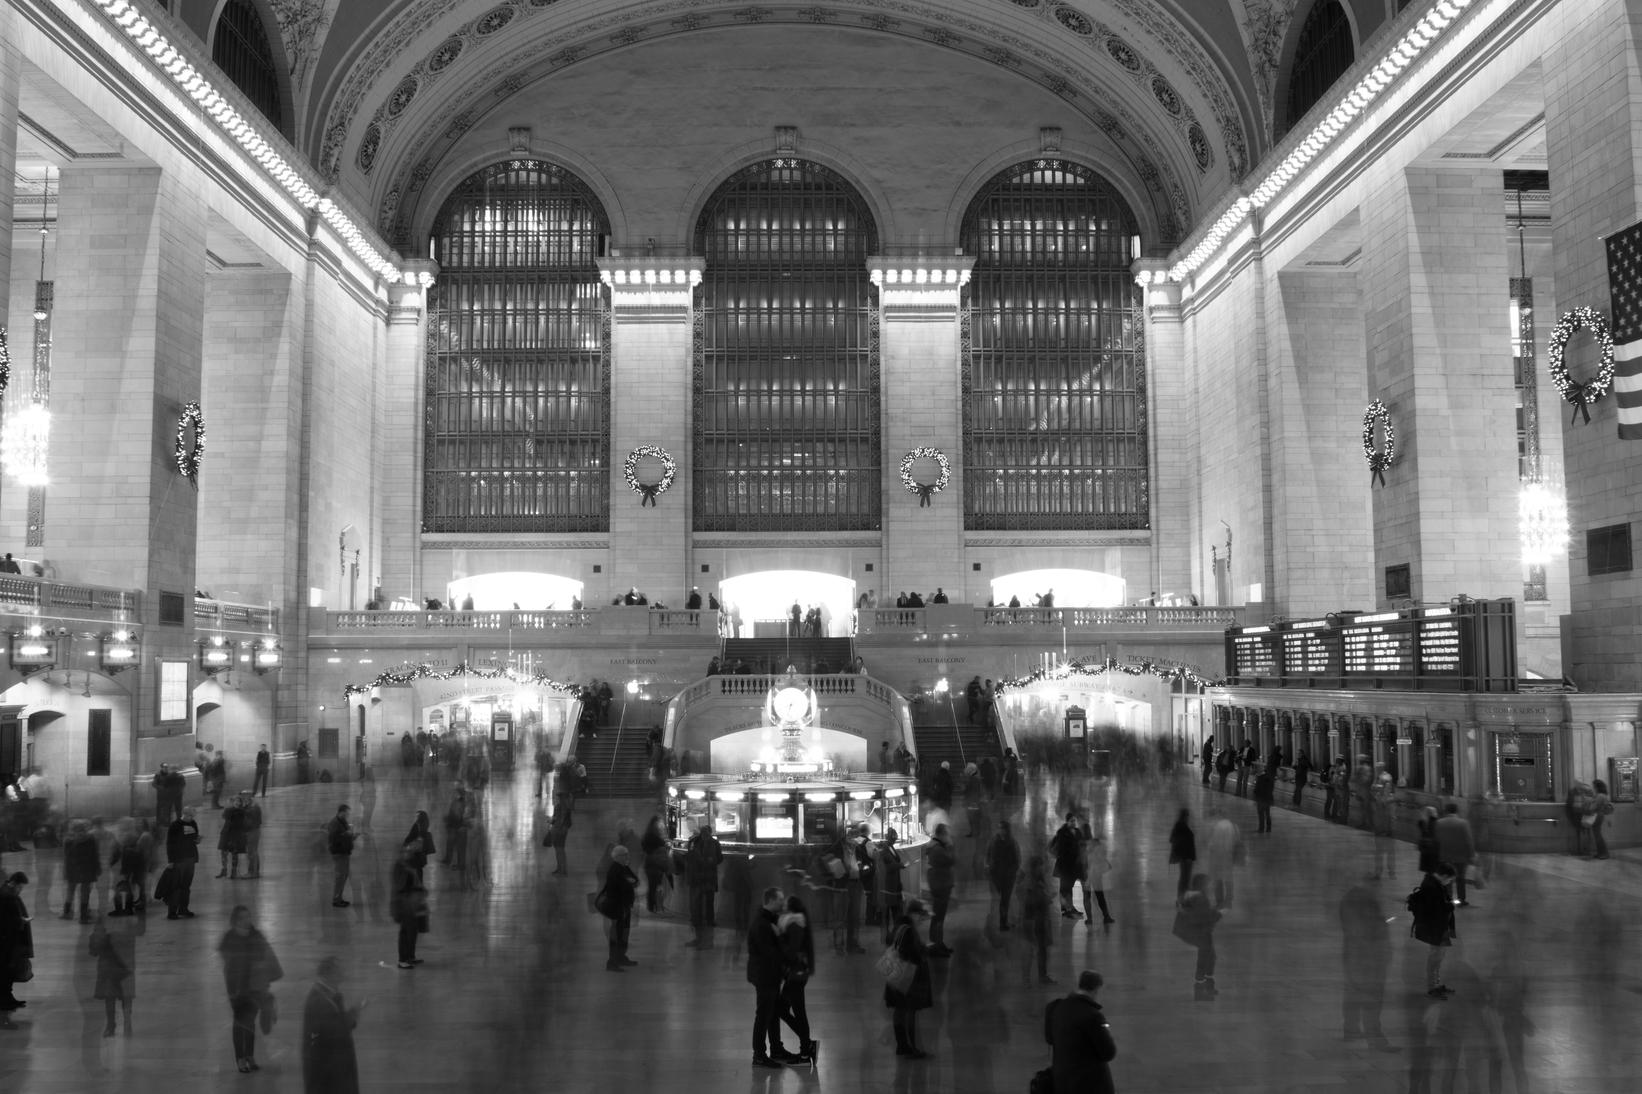 Sabine & Markus, Grand Central Station, New York City